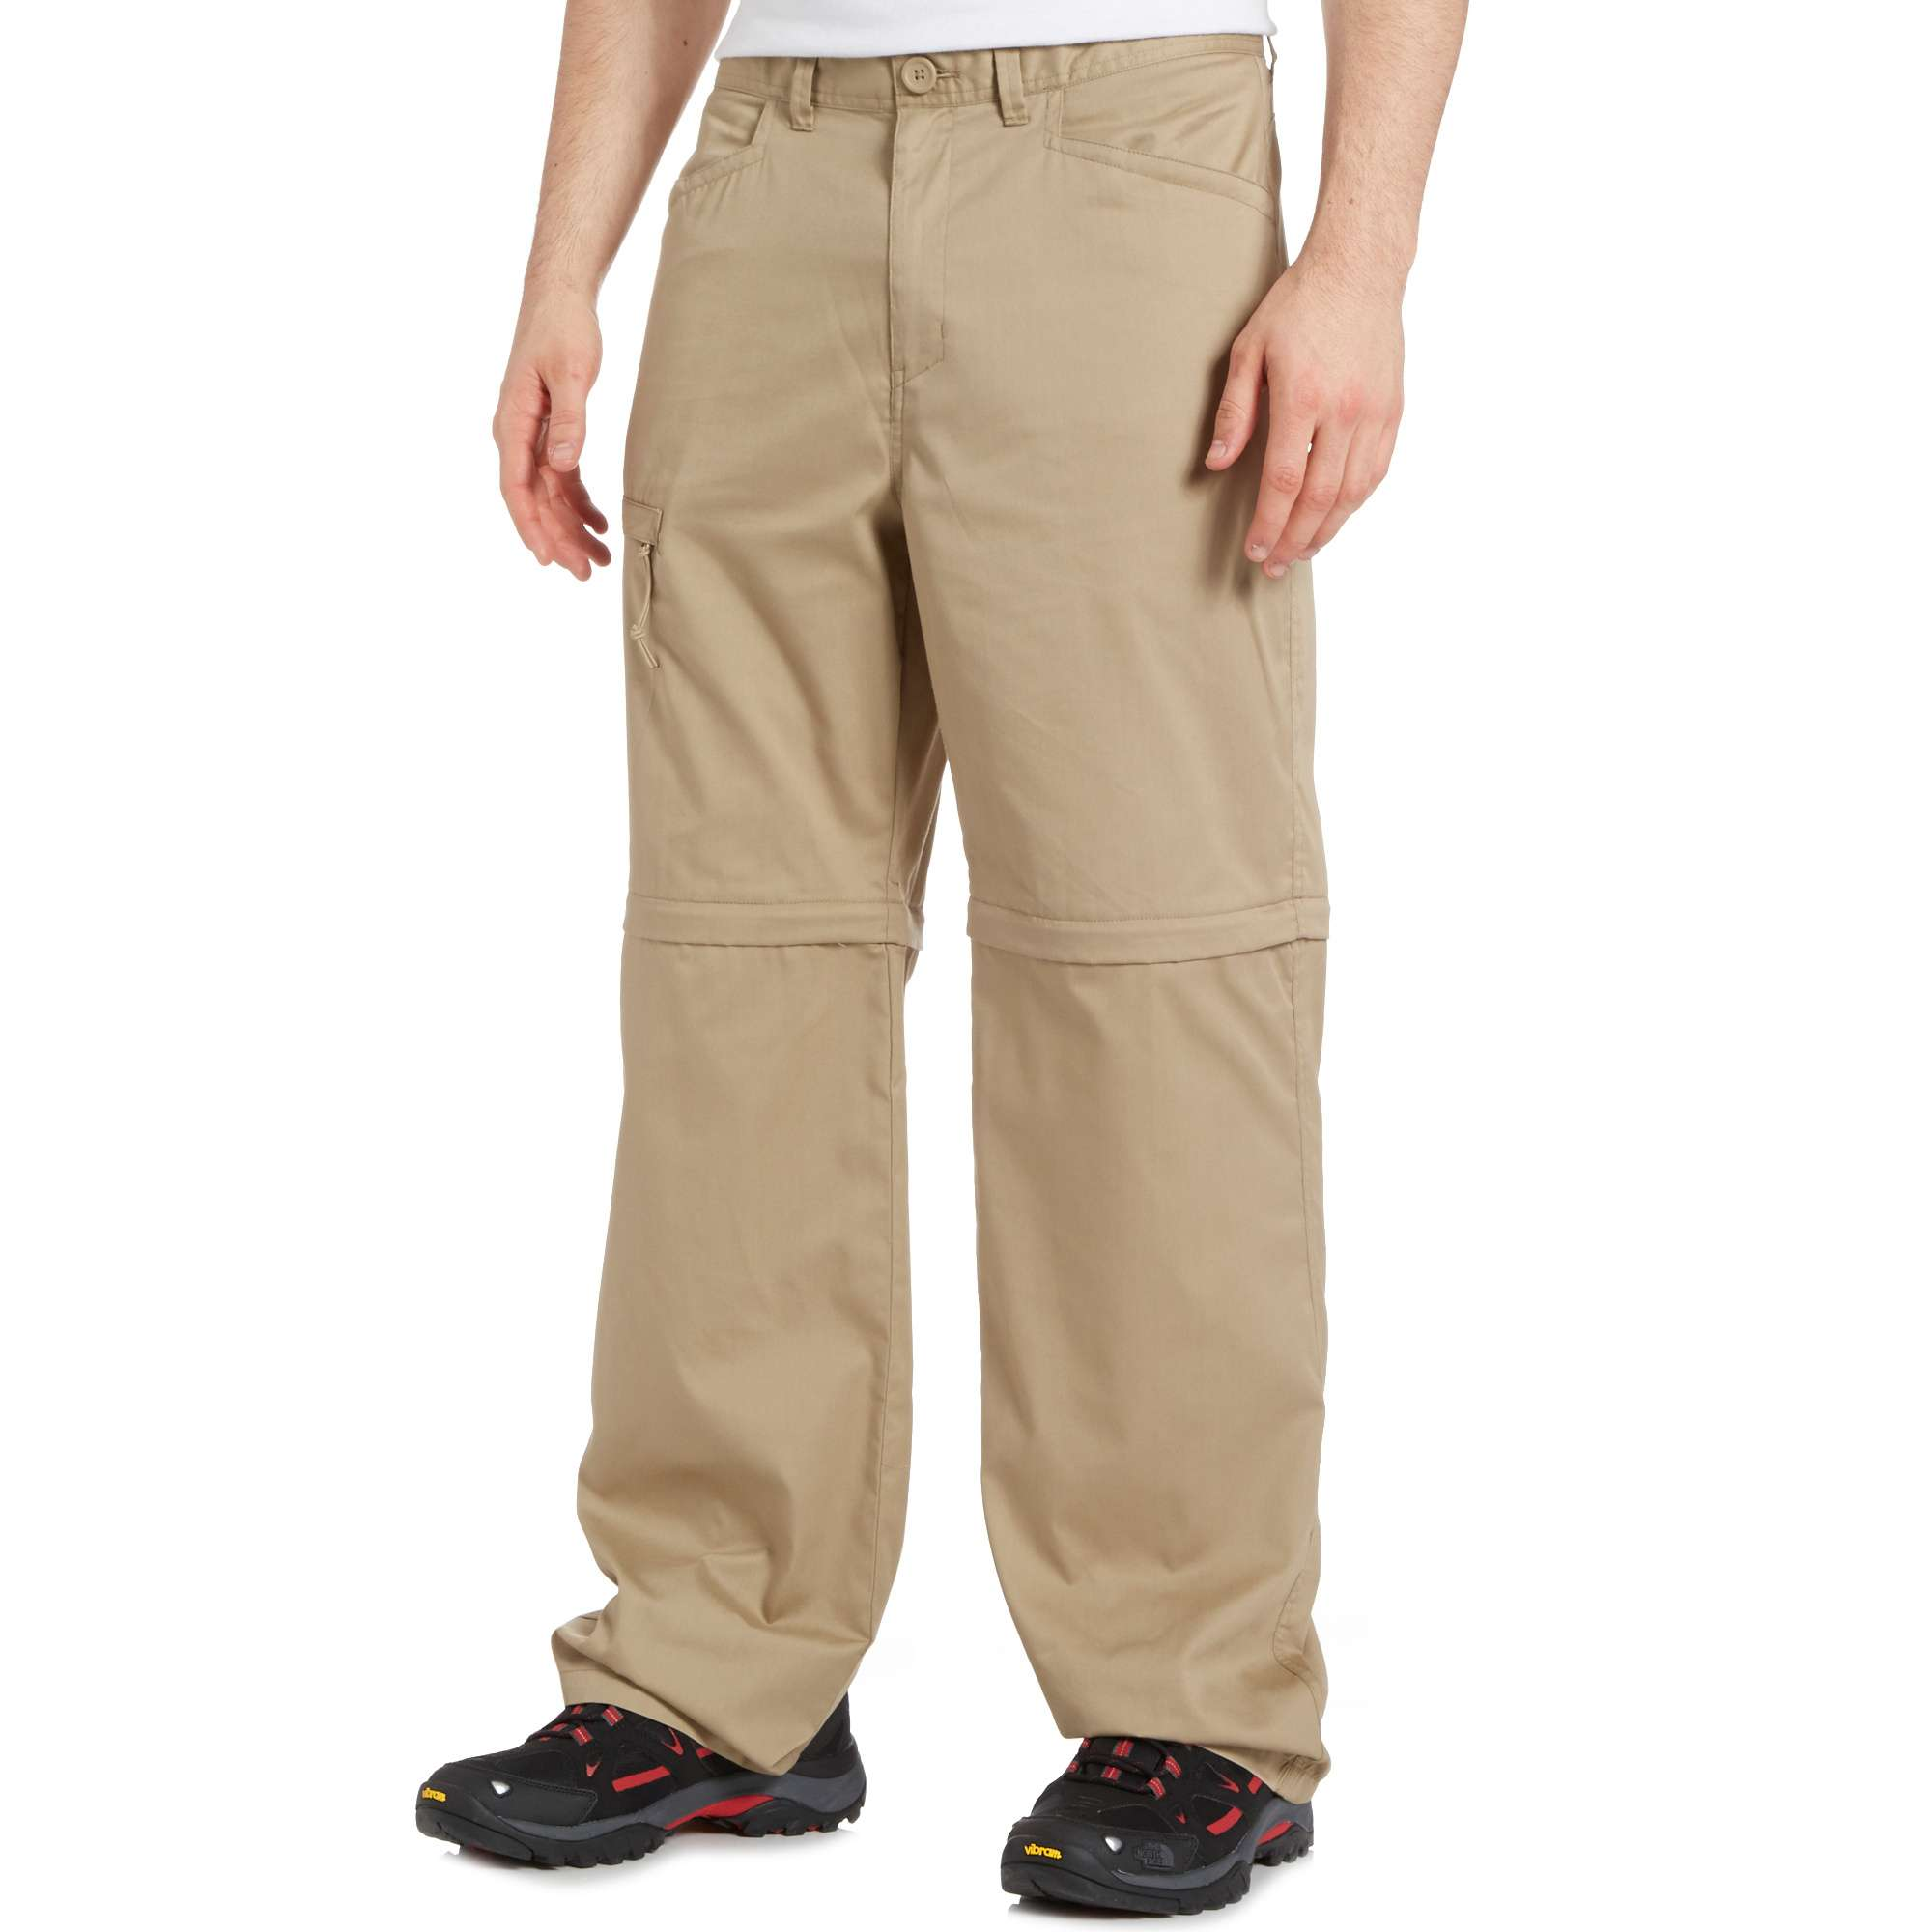 PETER STORM Men's Ramble Convertible Trousers (Regular)